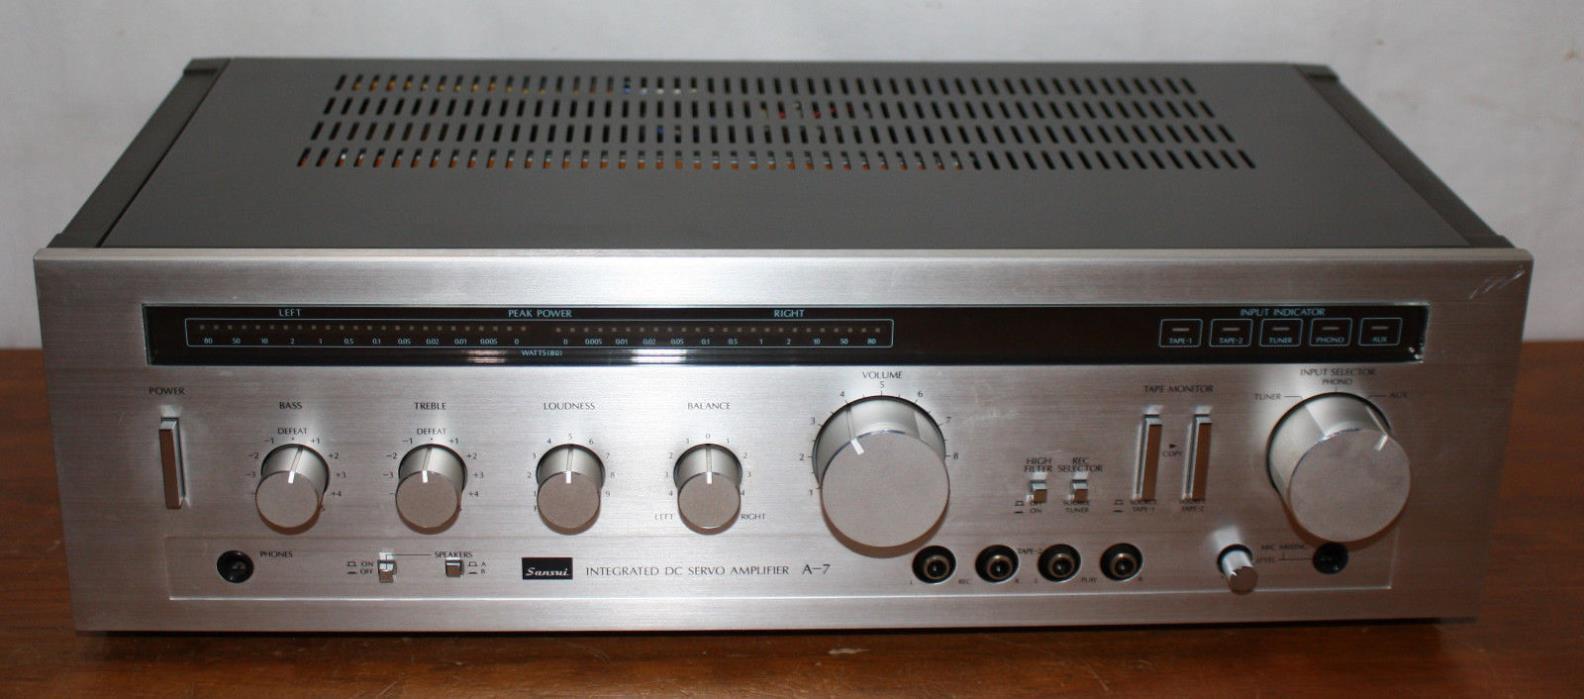 BROKEN - Sansui DC Servo Amplifier A-&, Stereo 2.0, Japan, Phono, Vintage